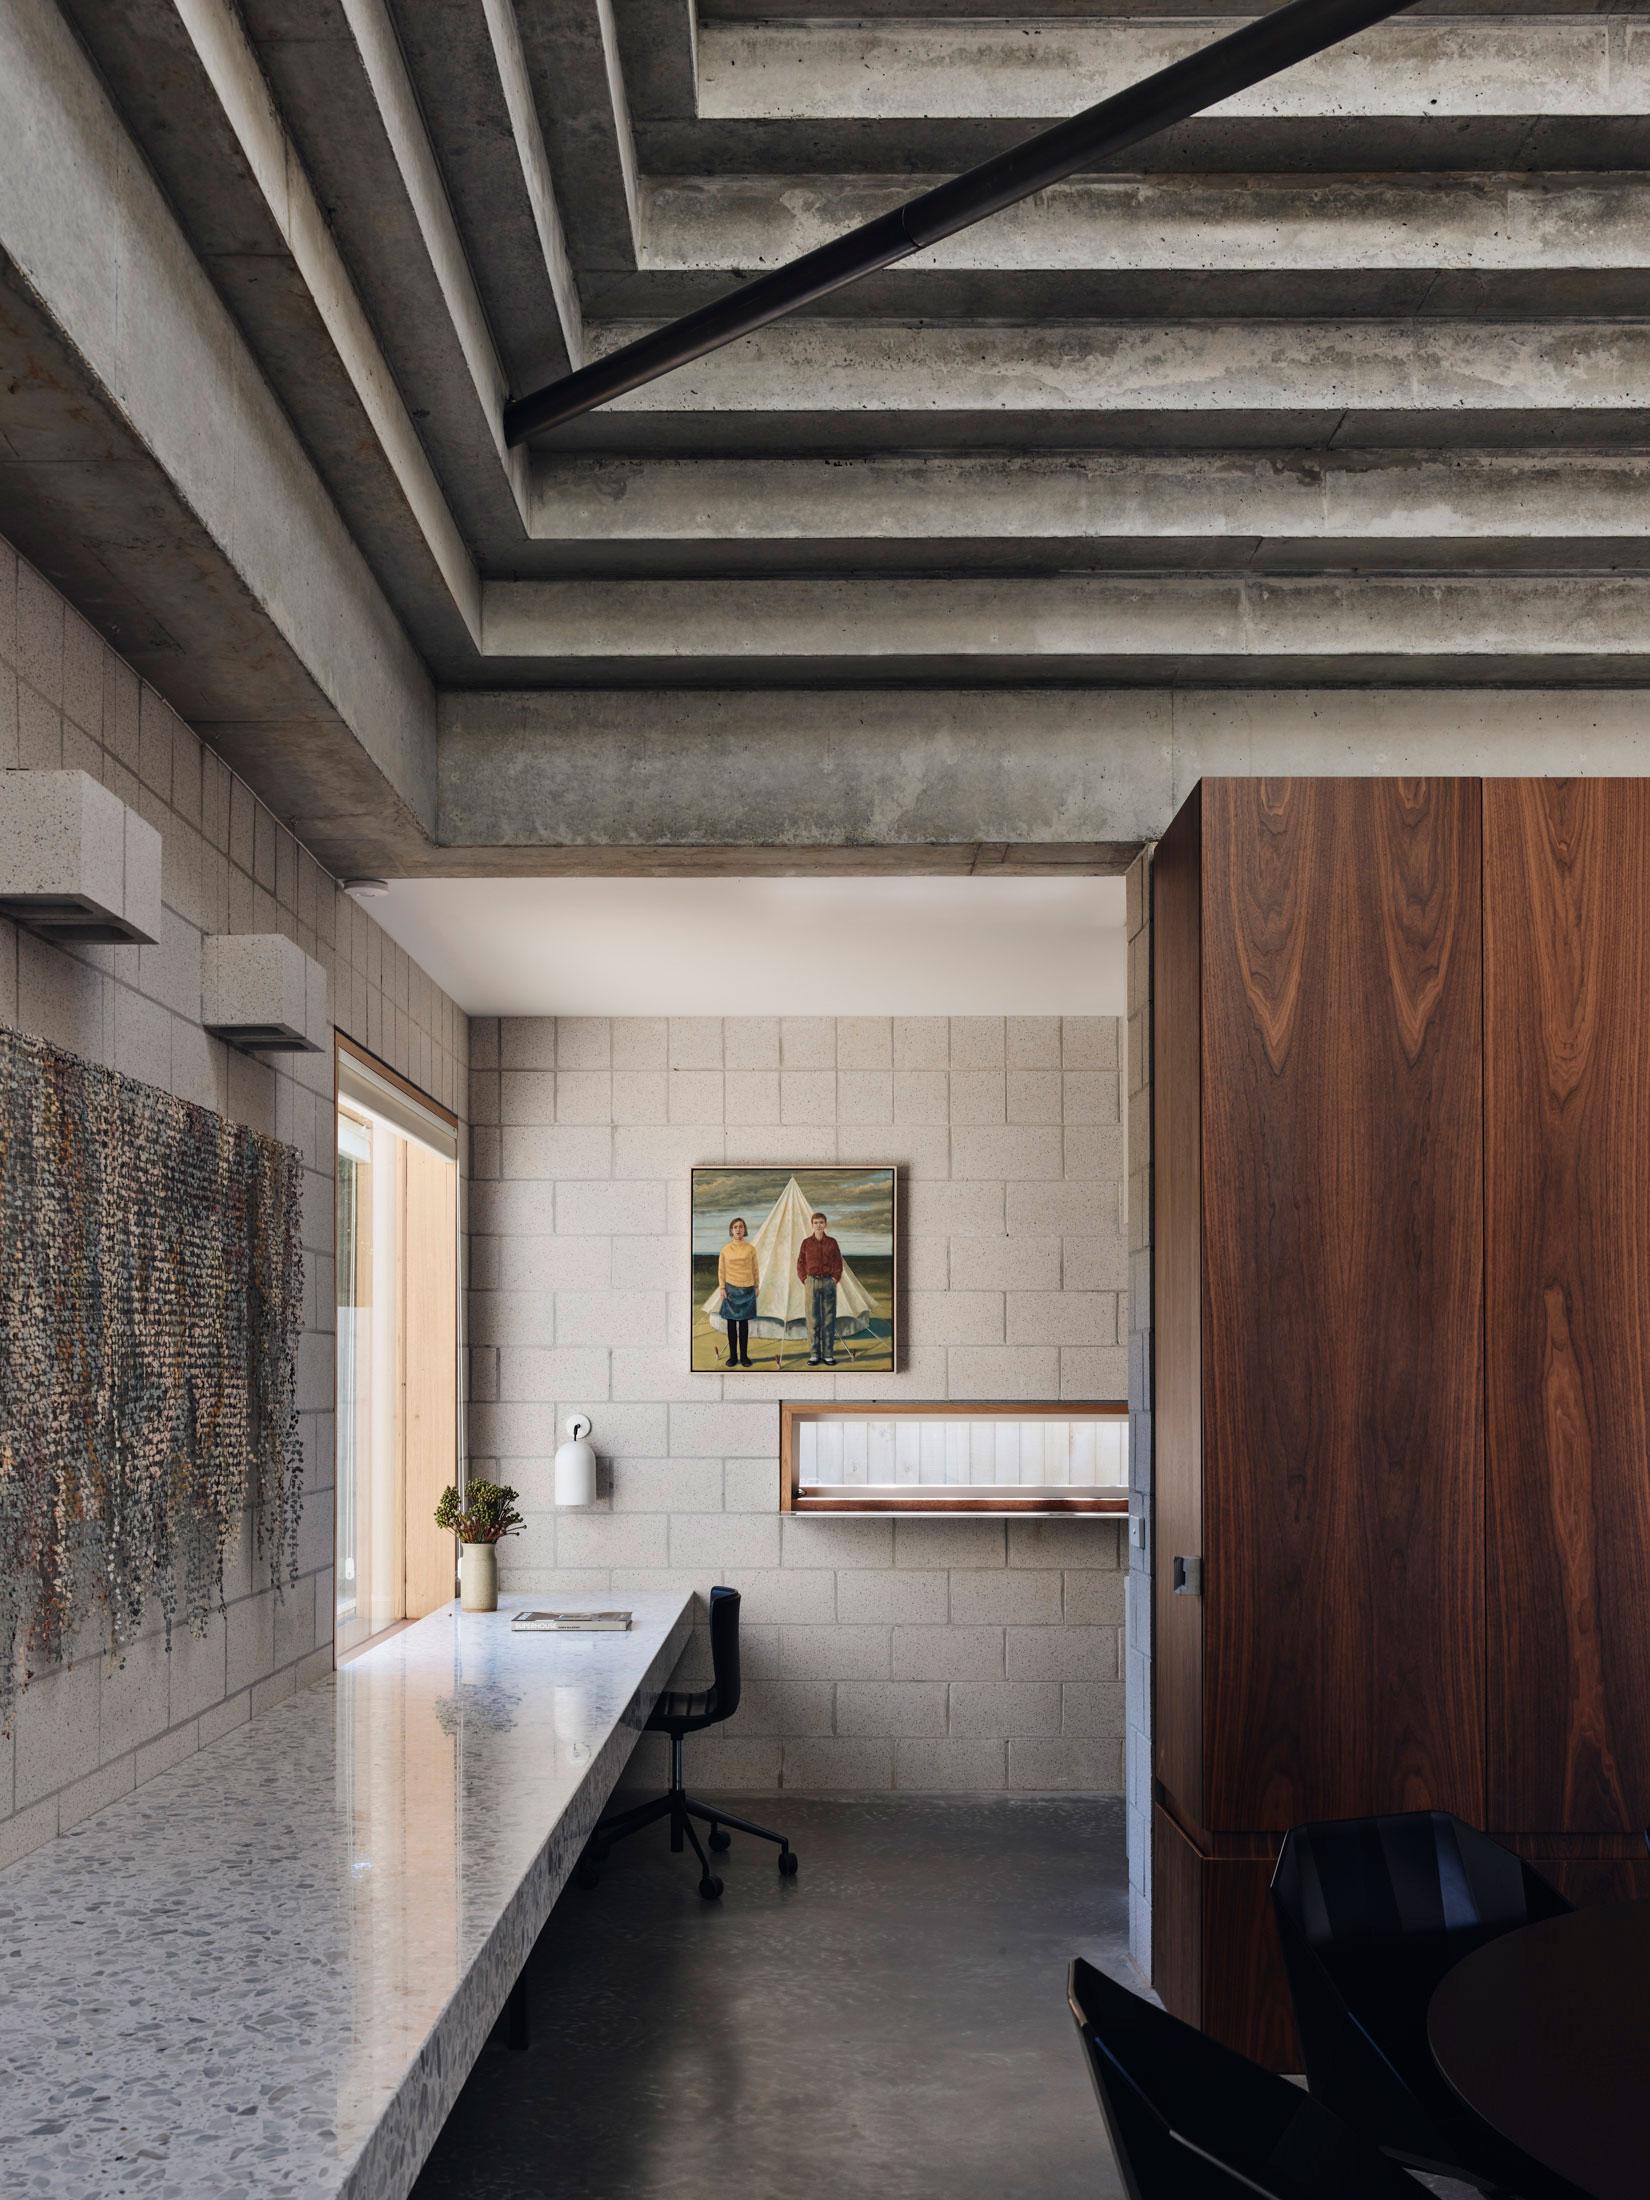 Architects Eat Bellows Beach House Flinders Masonry Architecture Photo Derek Swalwell Yellowtrace 27